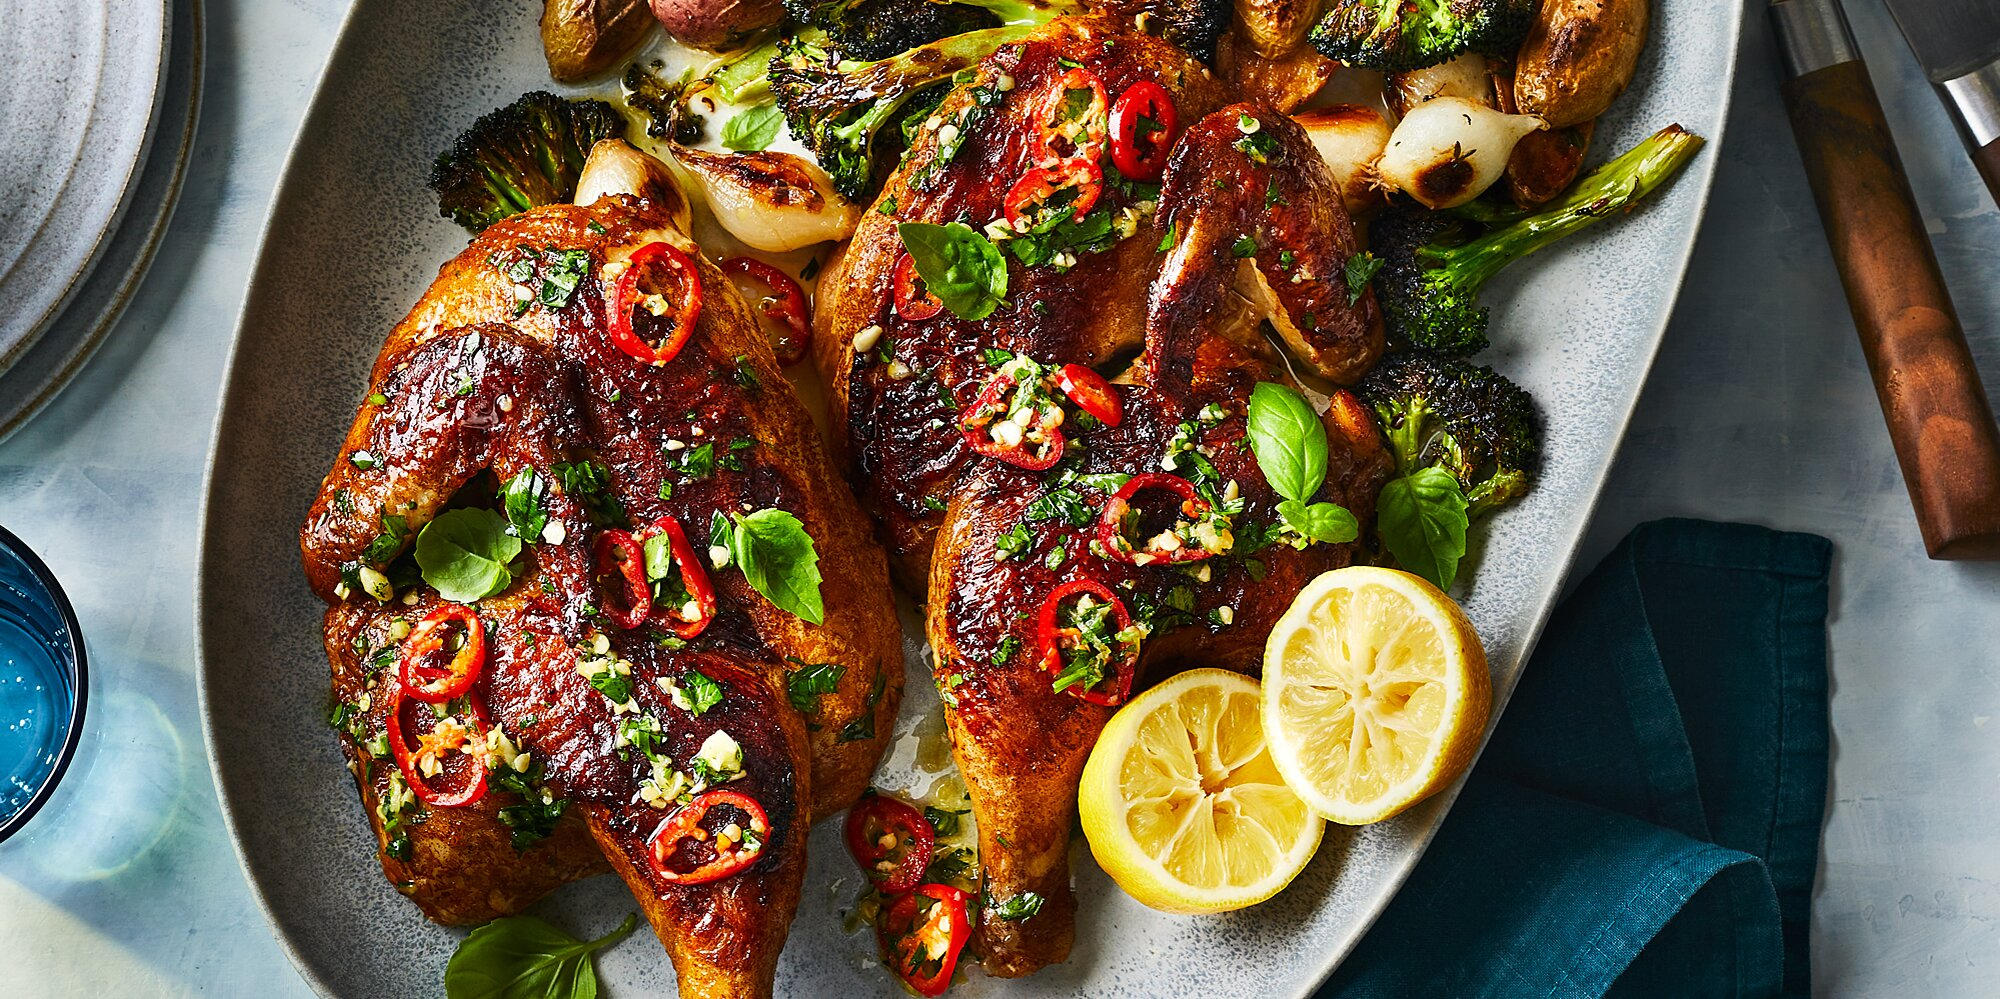 Roast Chickenwith Chile-Basil Vinaigrette, Charred Broccoli, and Potatoes